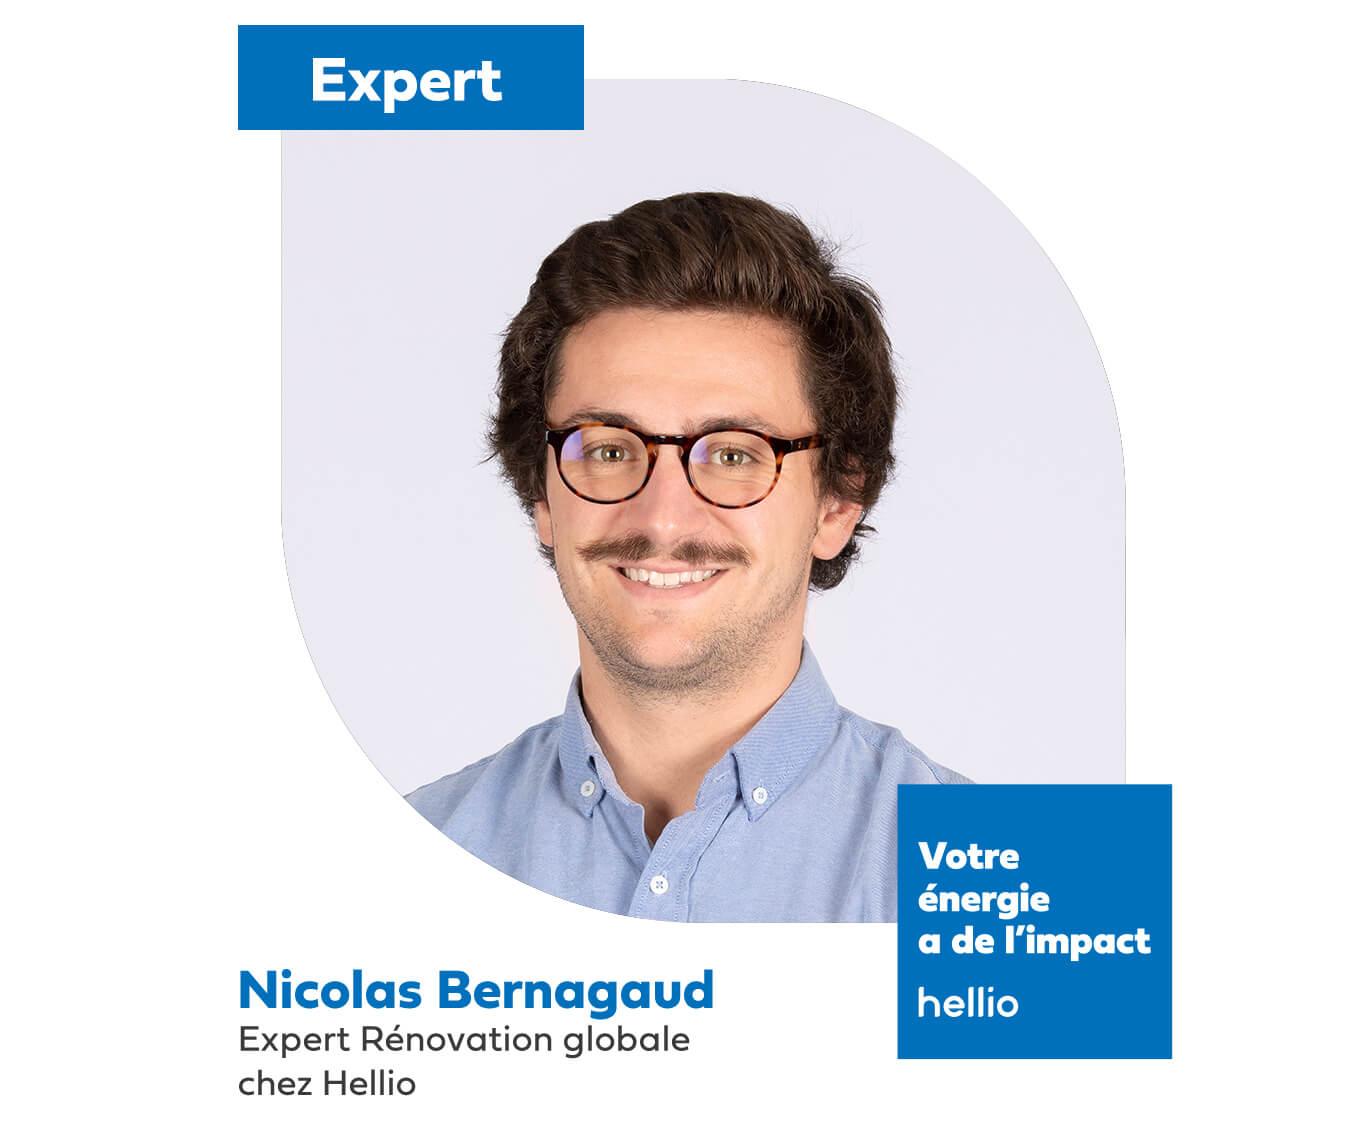 Nicolas Bernagaud expert Hellio rénovation globale